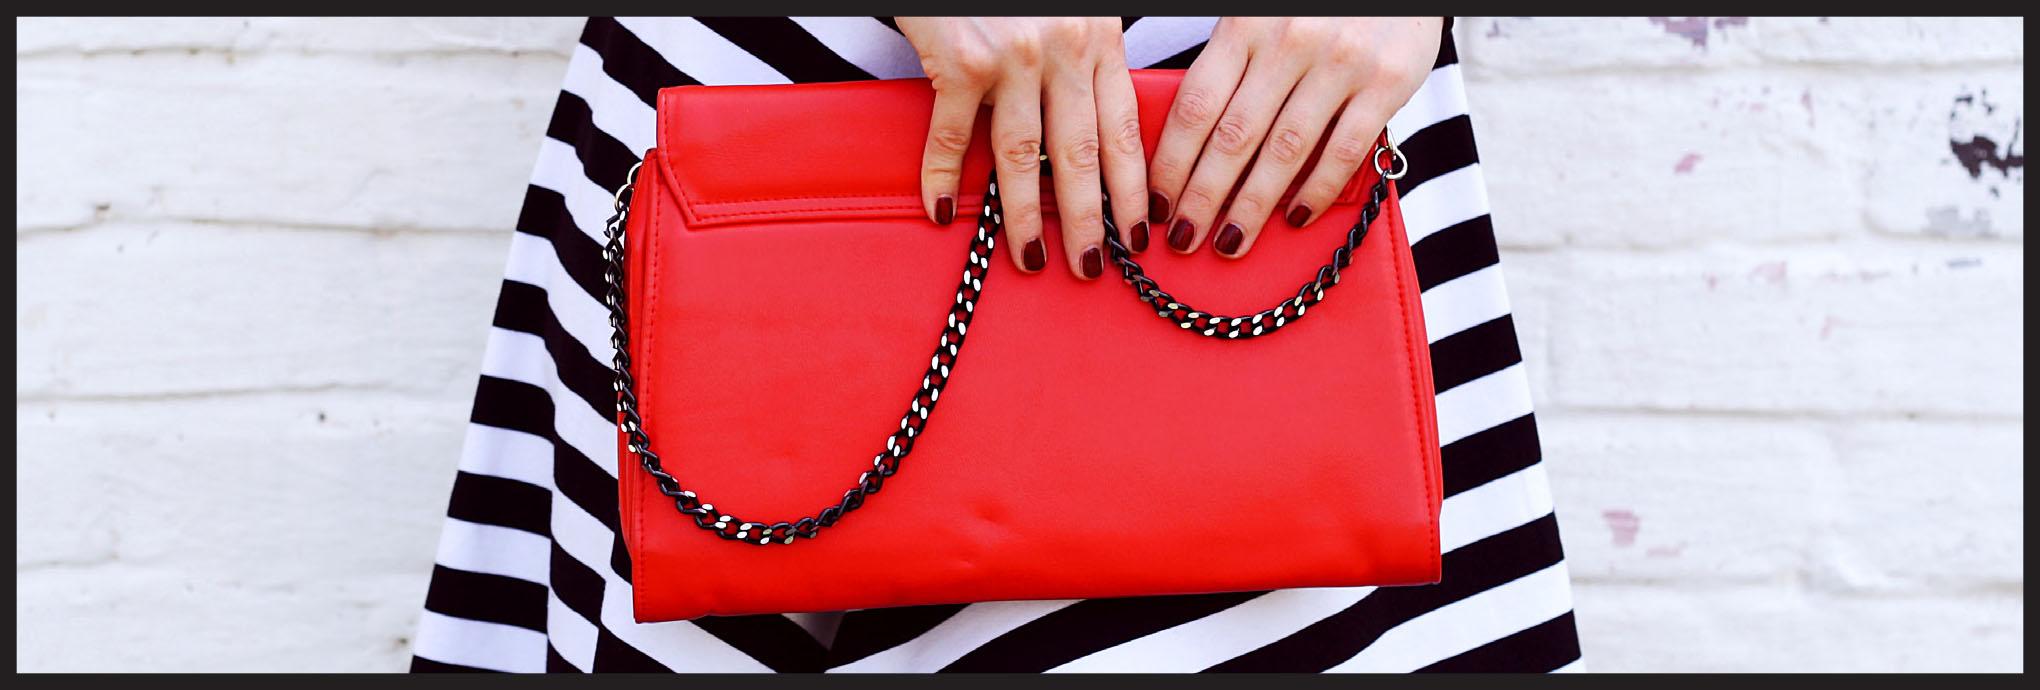 WMIS Handbag Header